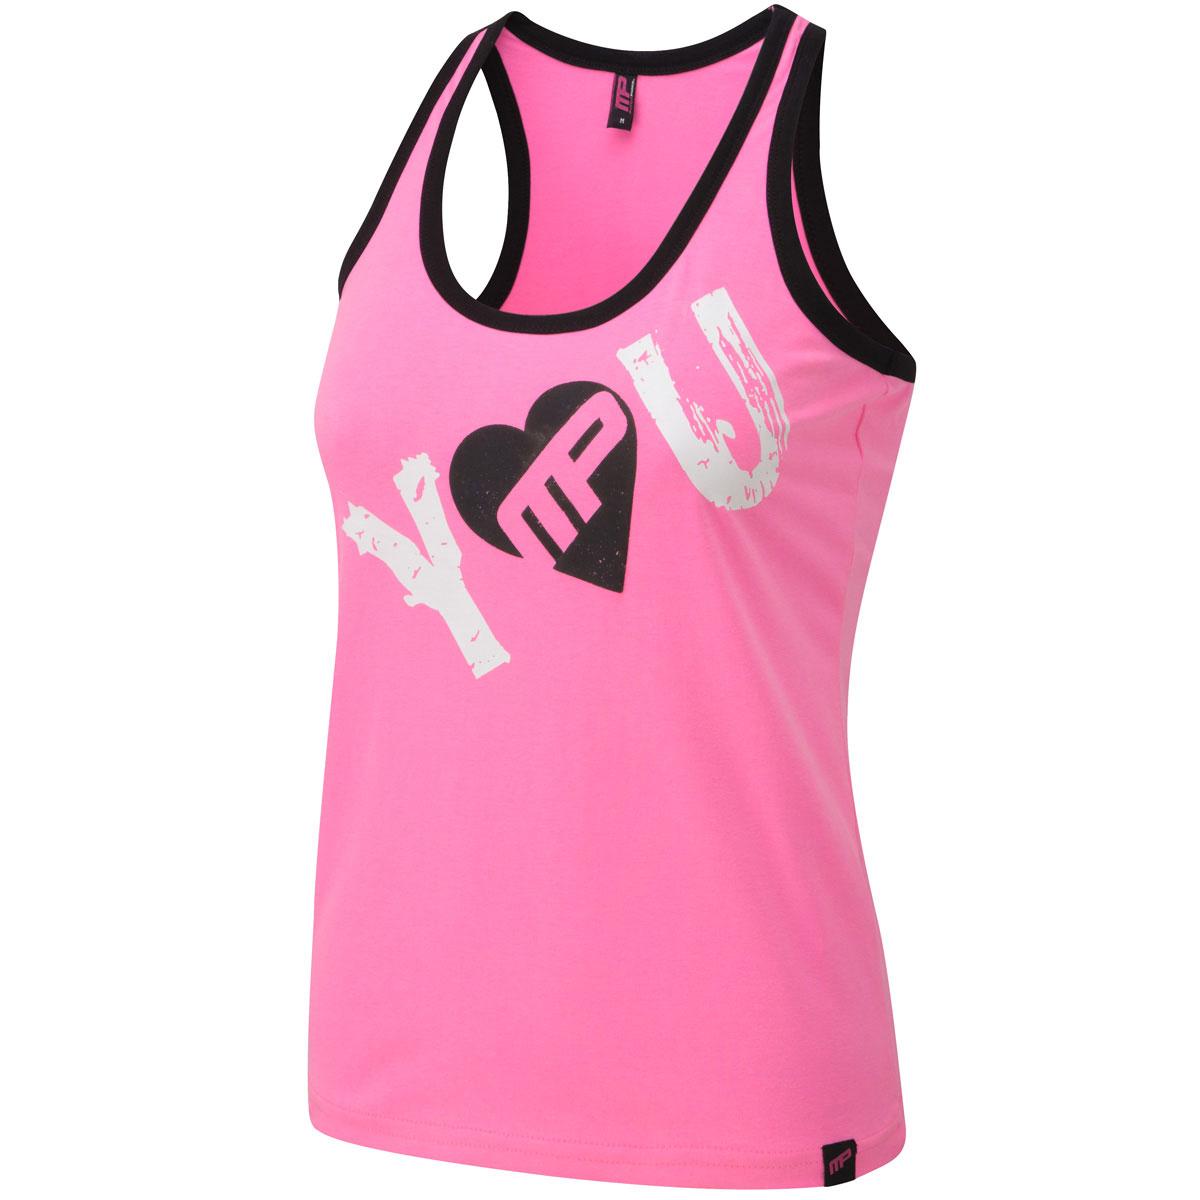 MusclePharm-Para-Mujer-Camiseta-sin-mangas-chaleco-impreso-Gimnasio-Camiseta-De-Entrenamiento-De